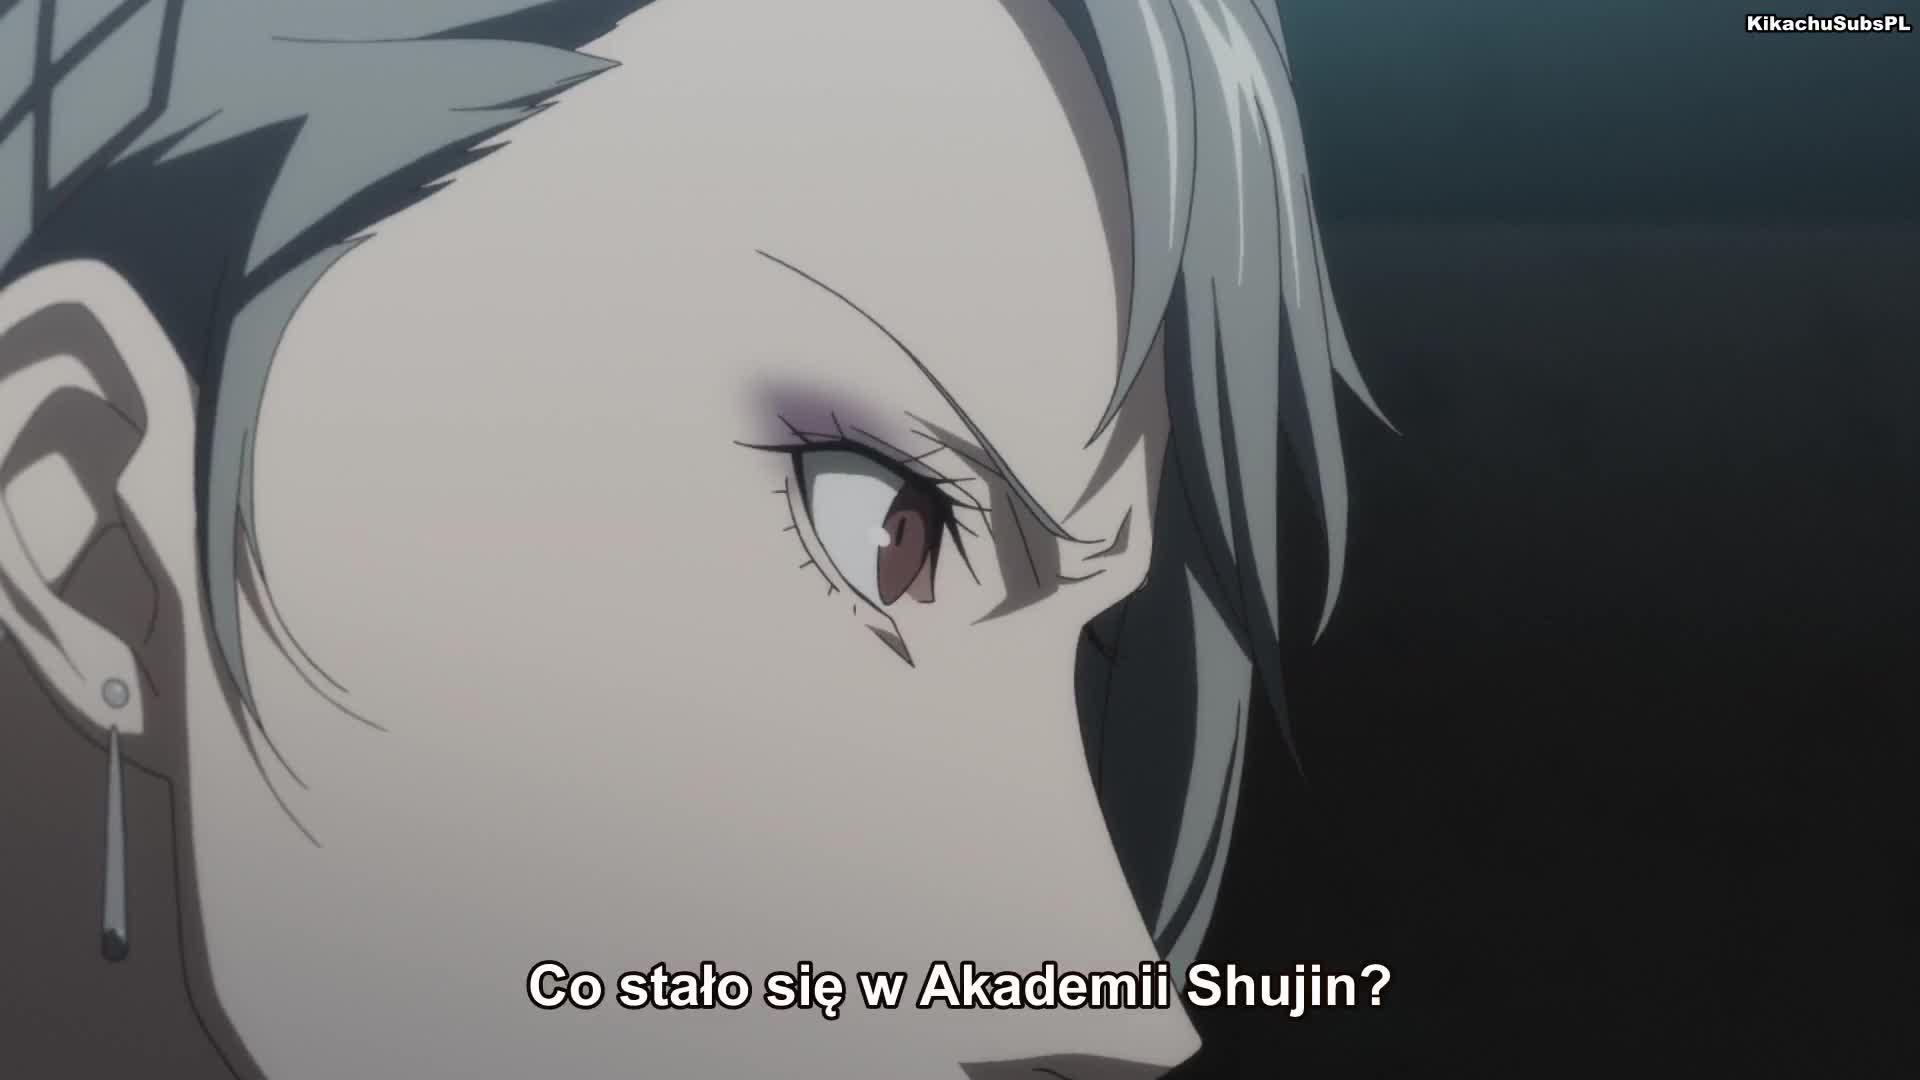 [KikachuSubsPL]Persona 5 The Animation 02 Napisy PL